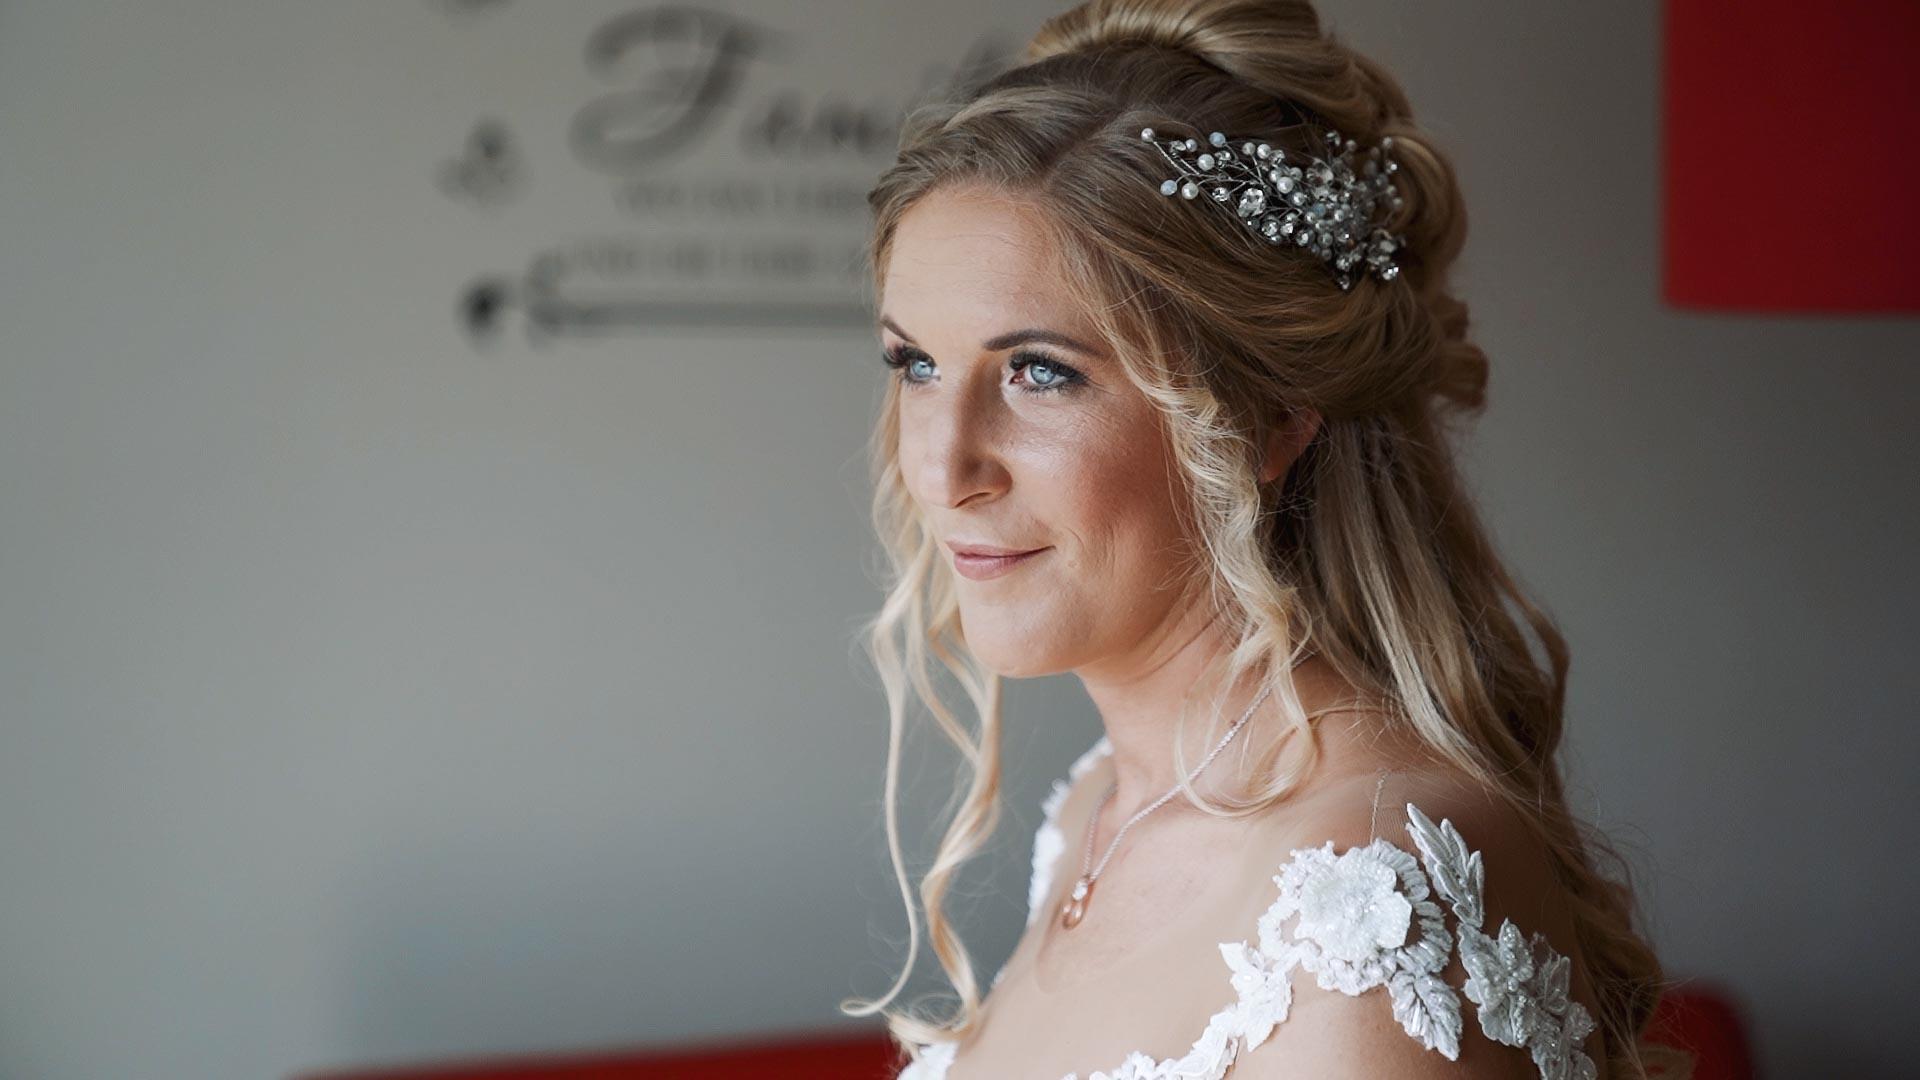 Pascal & Jenny Hochzeitsfilm Schloss Vettelhoven Videograf Hochzeit Filmemacher 029